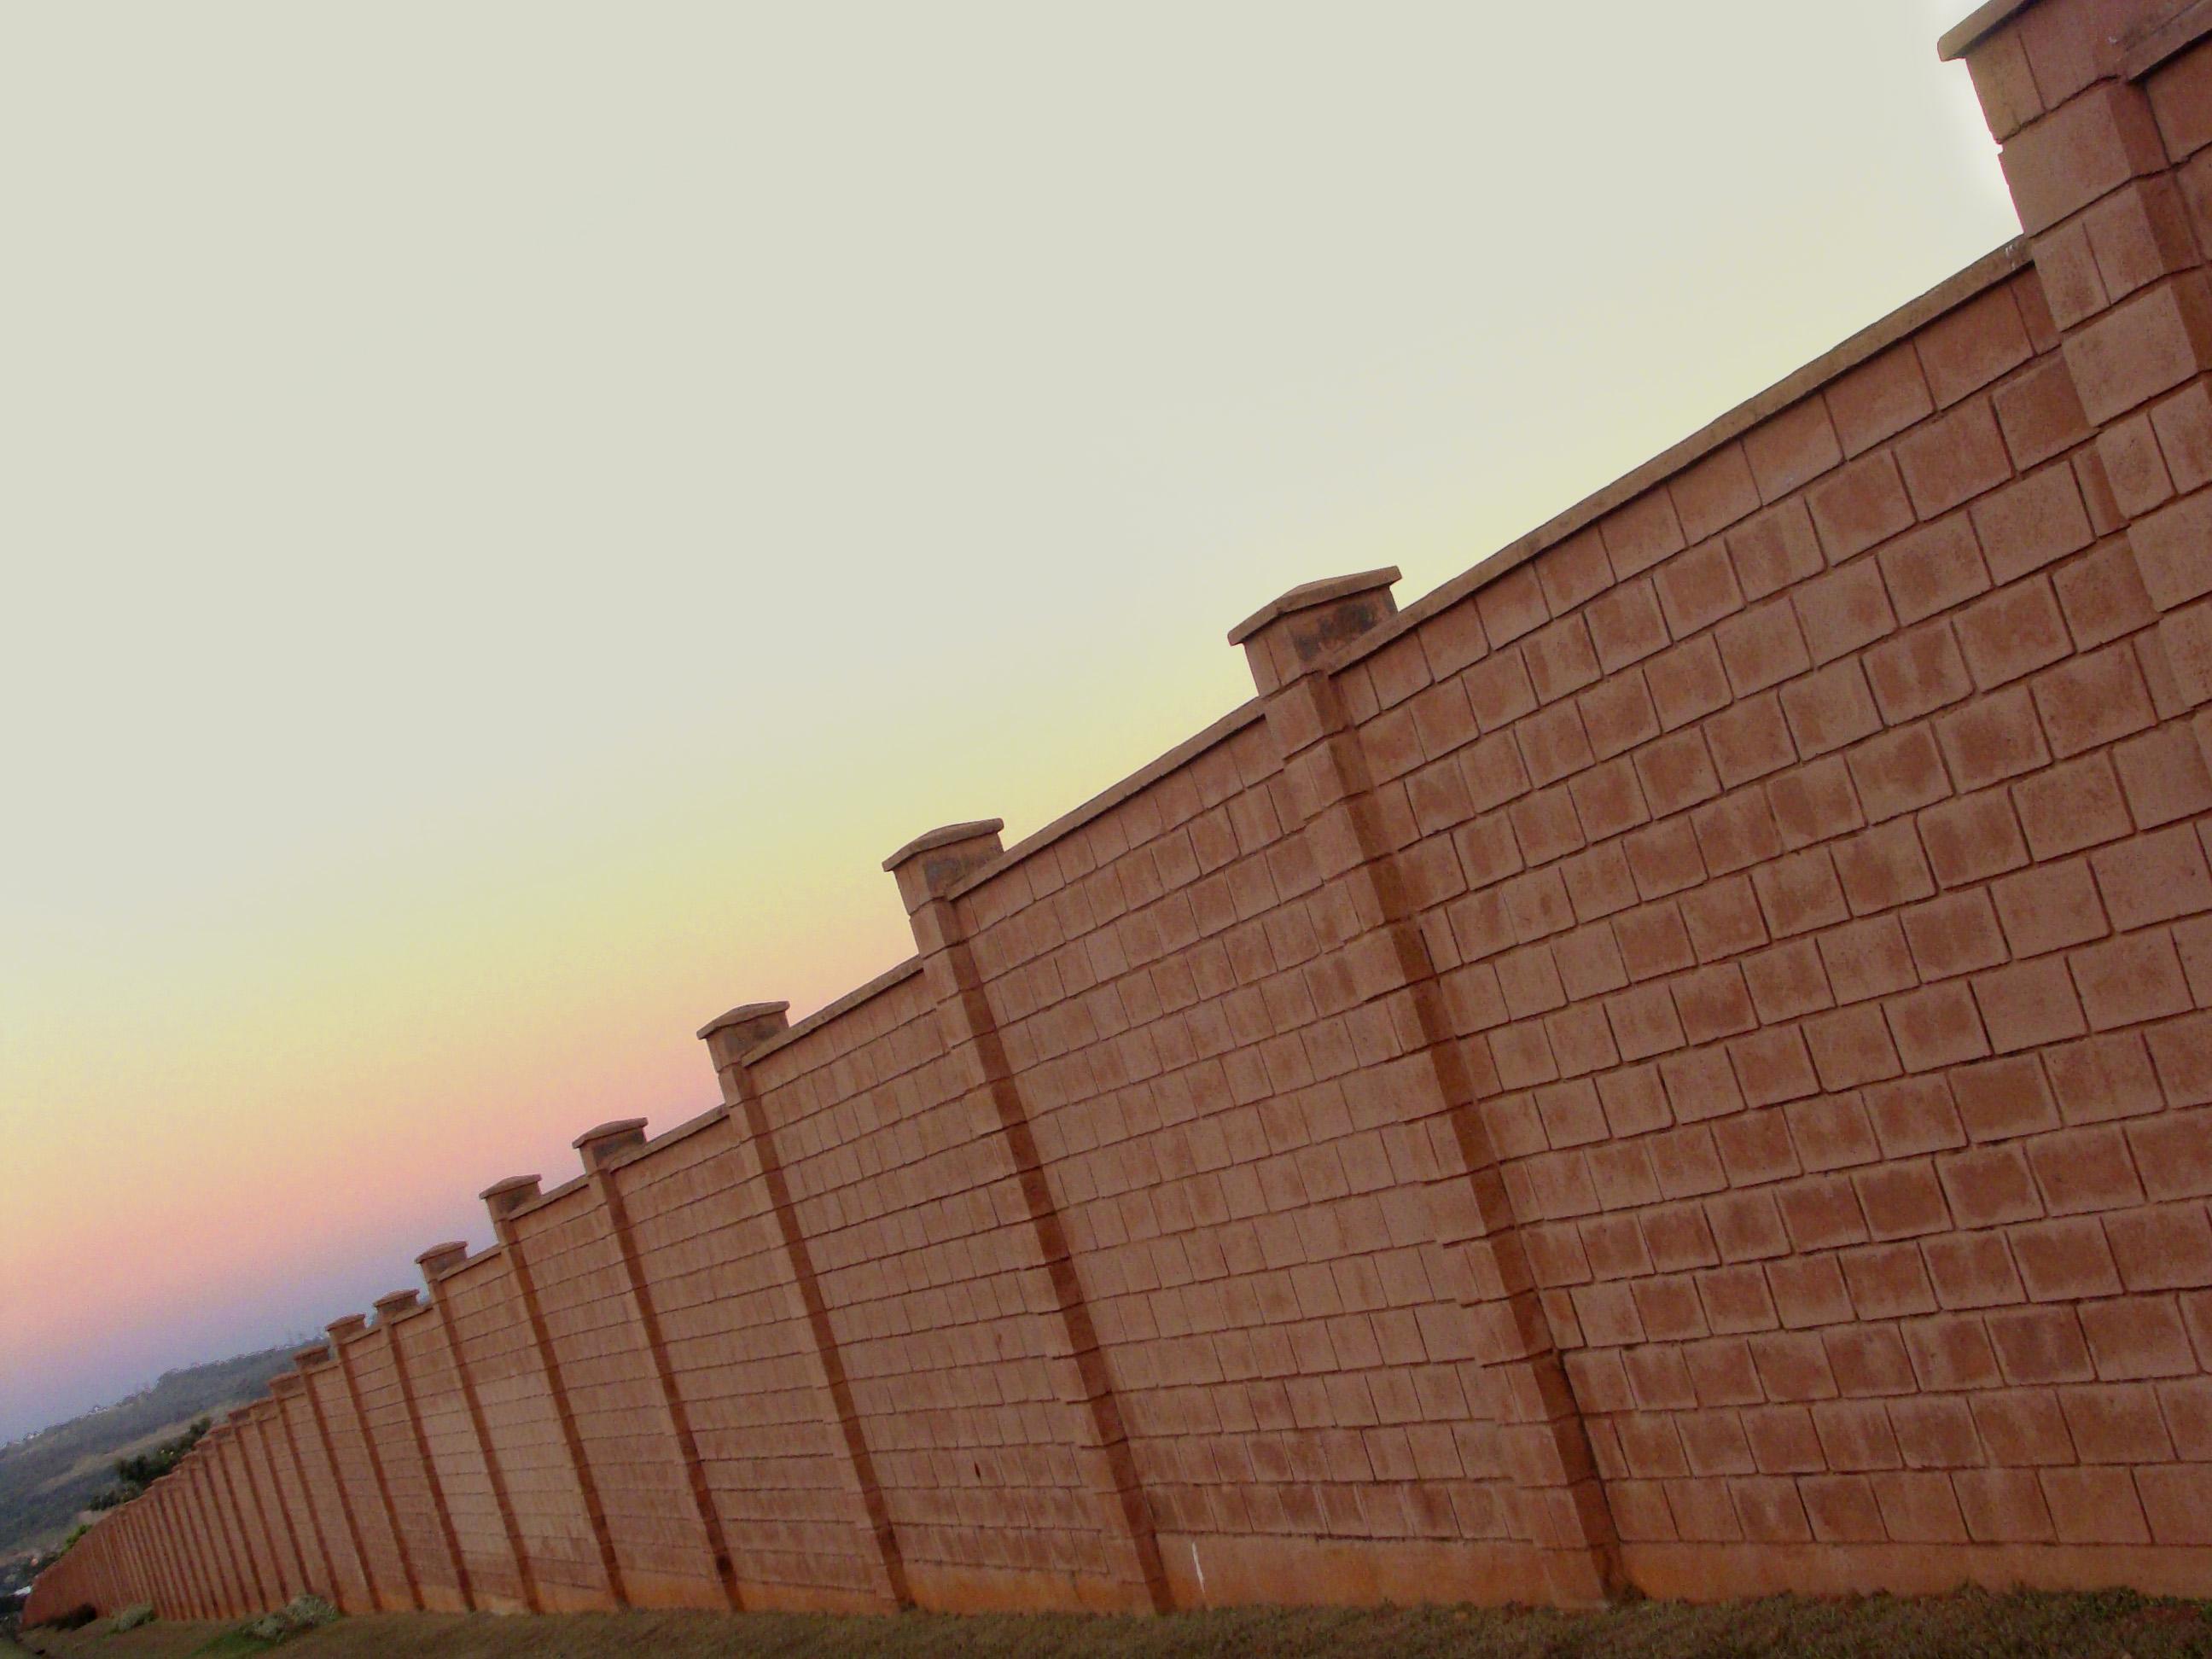 Wallpaper Sunlight Sunset Architecture Building Sky Wall